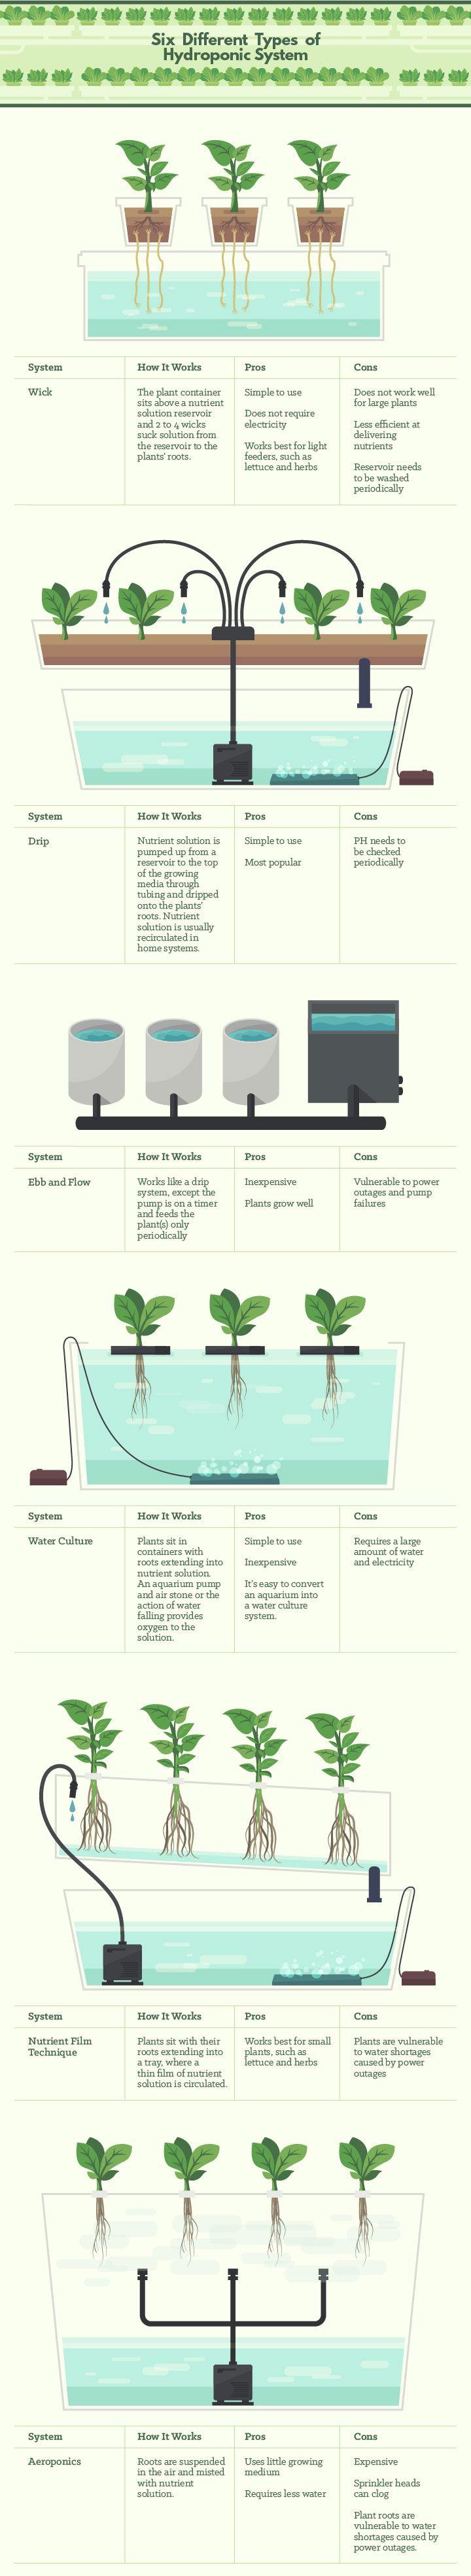 Six Different Types of Hydroponics